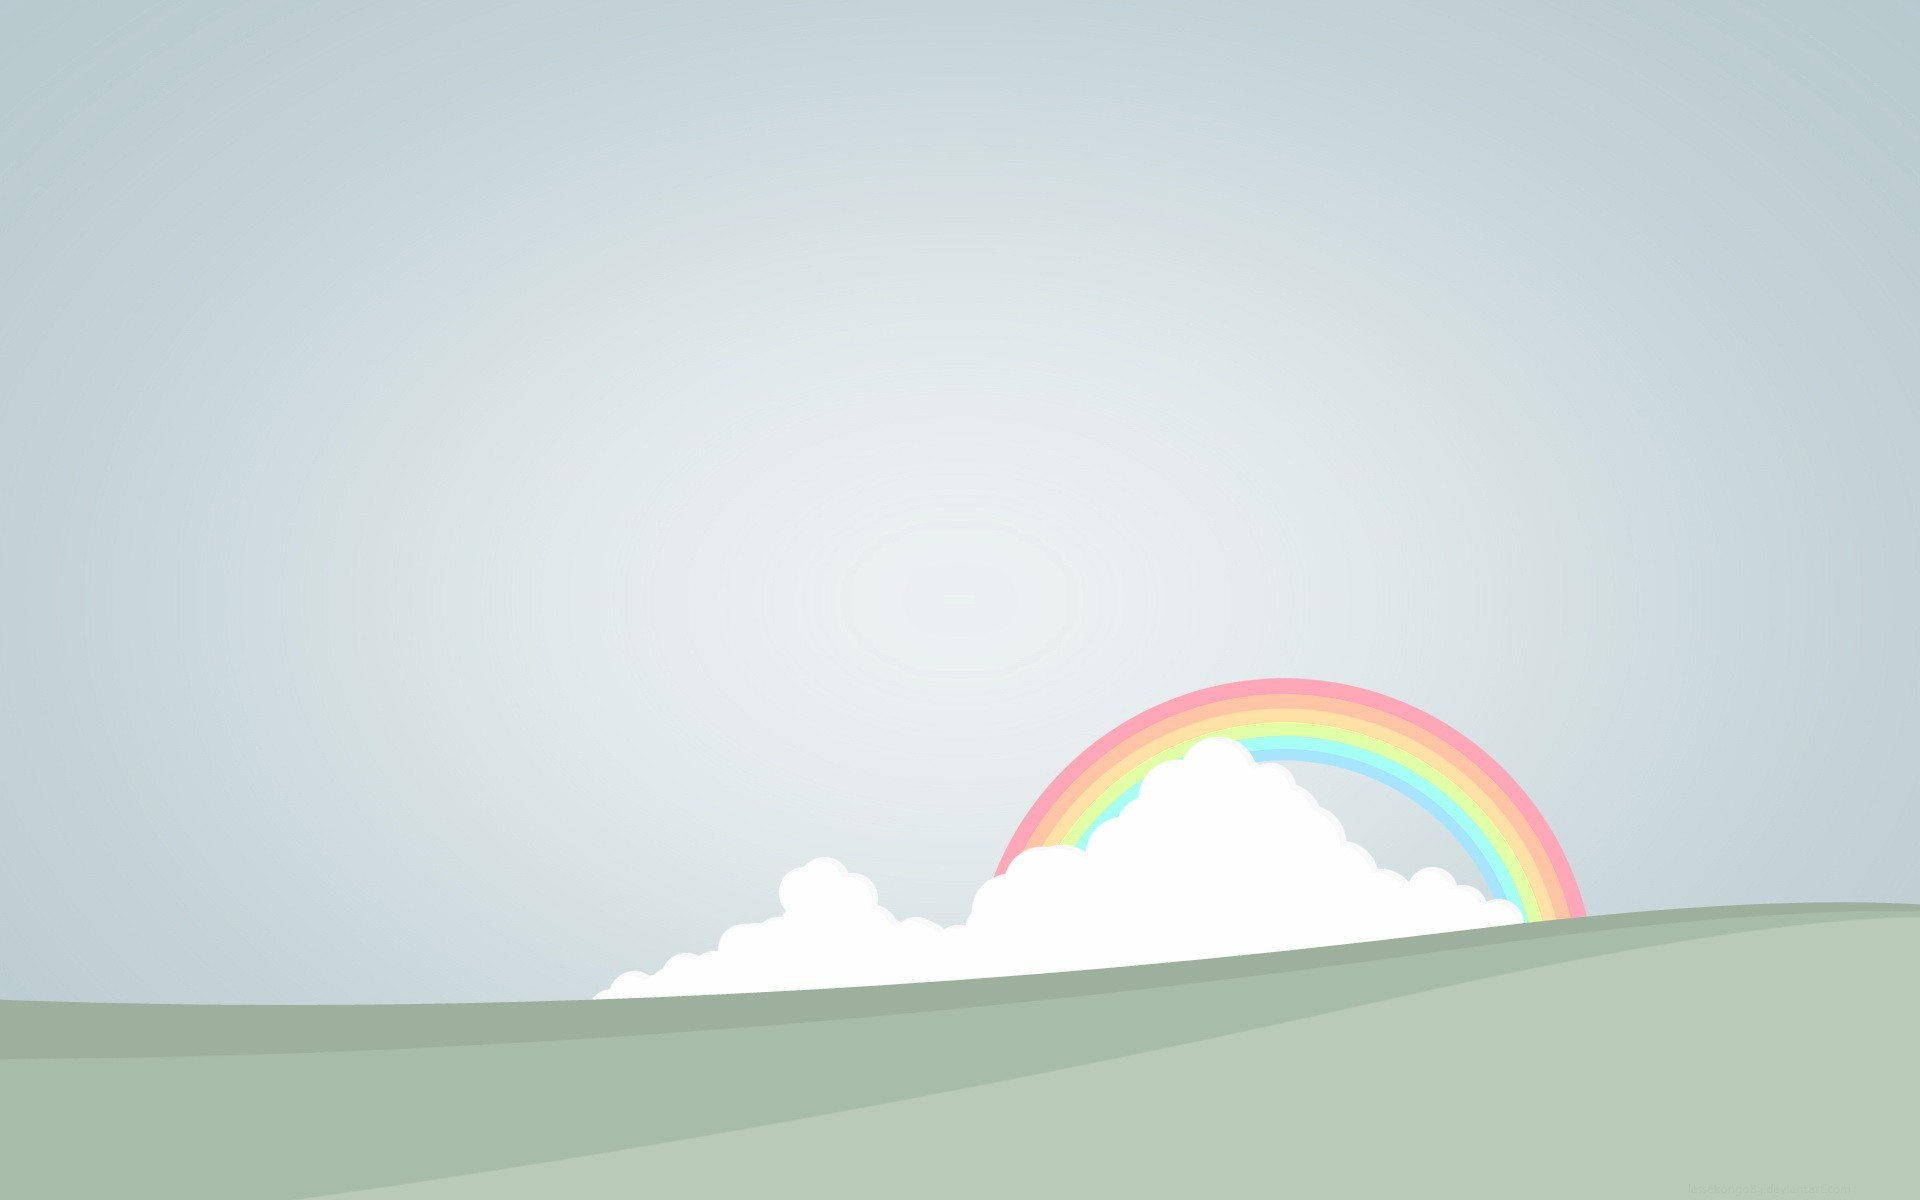 Облака вектор  № 3208130 без смс